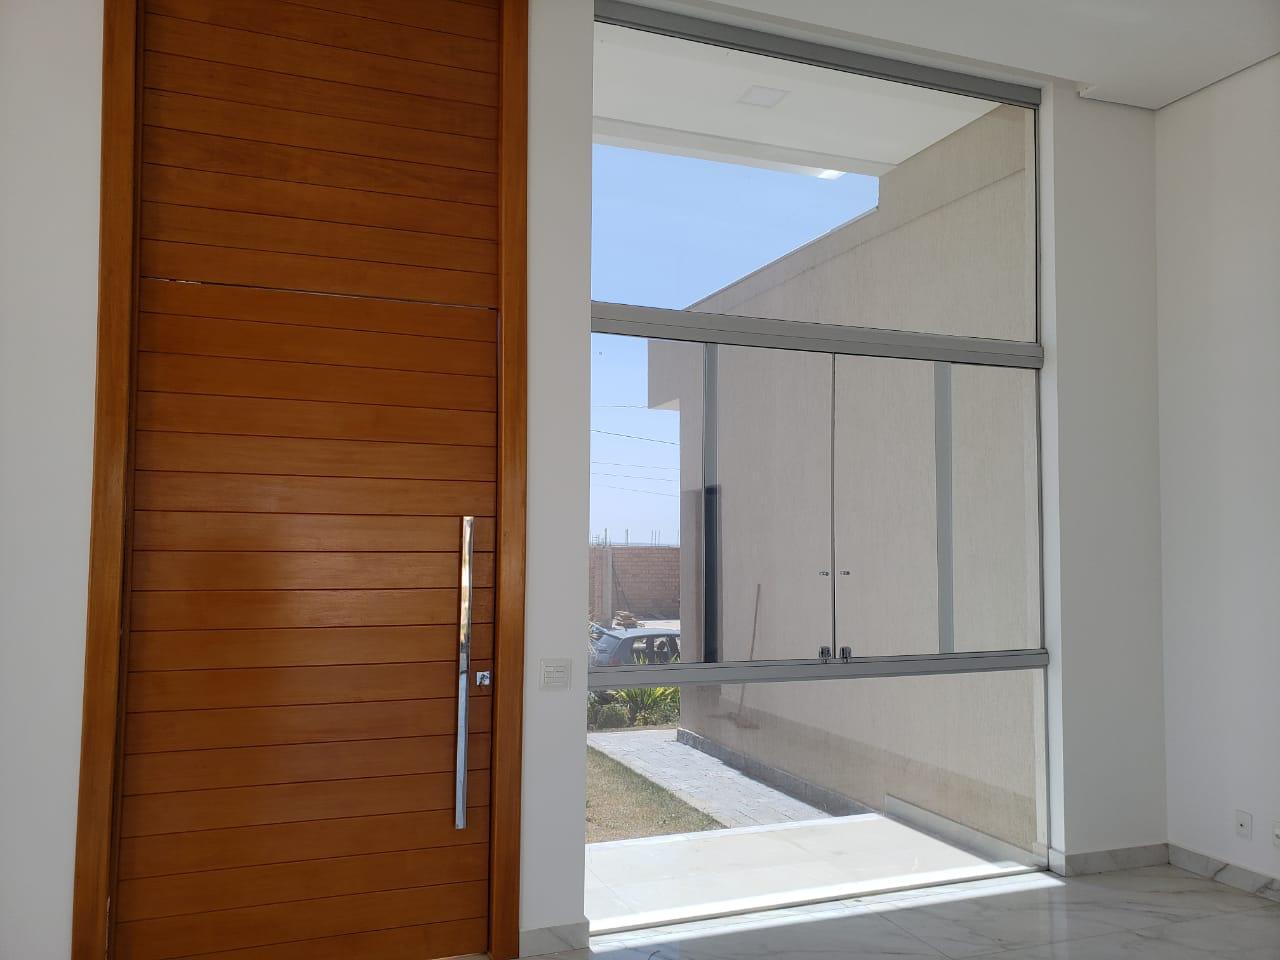 Insulfilm Comercial, Residencial e Automotivo no bairro Minas Caixa